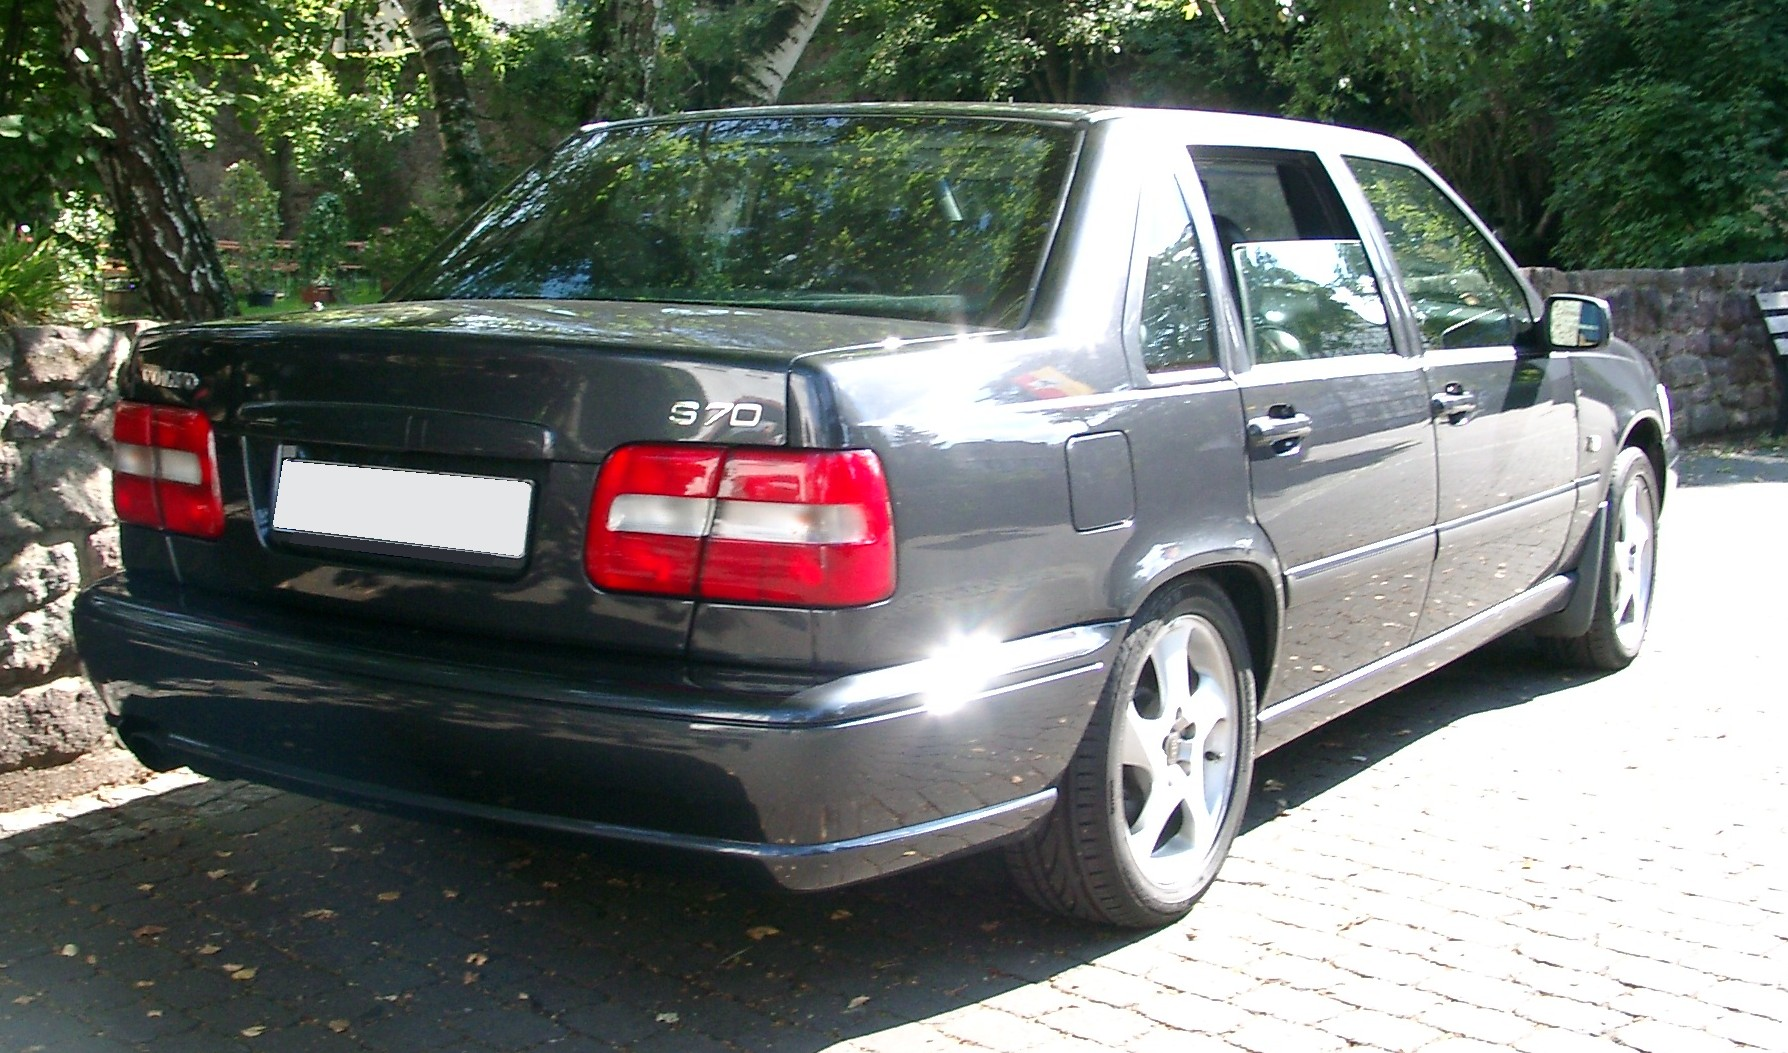 File Volvo S70 Rear 20070823 Jpg Wikimedia Commons